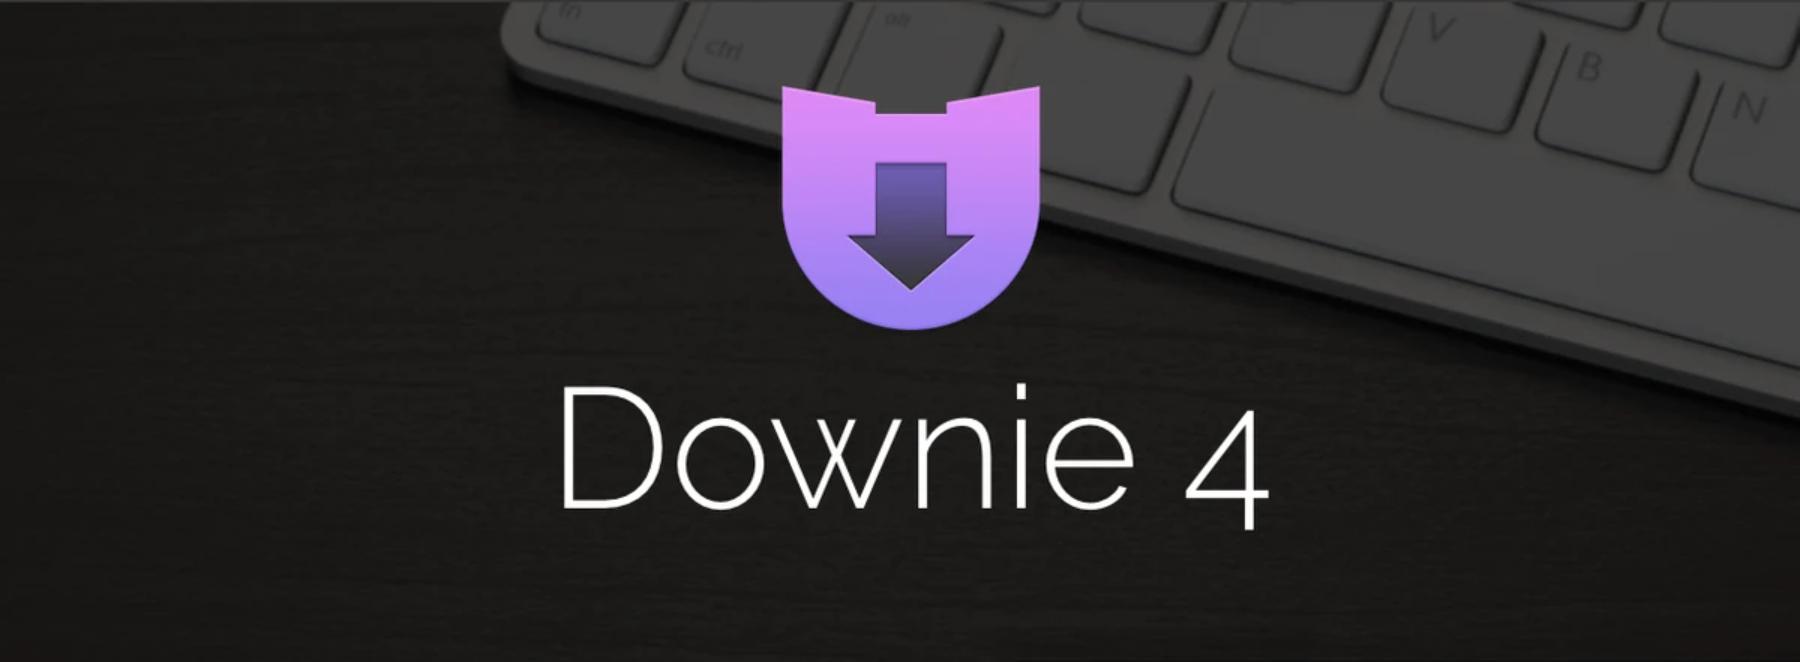 视频下载软件 Downie 4 for Mac 已激活开心版